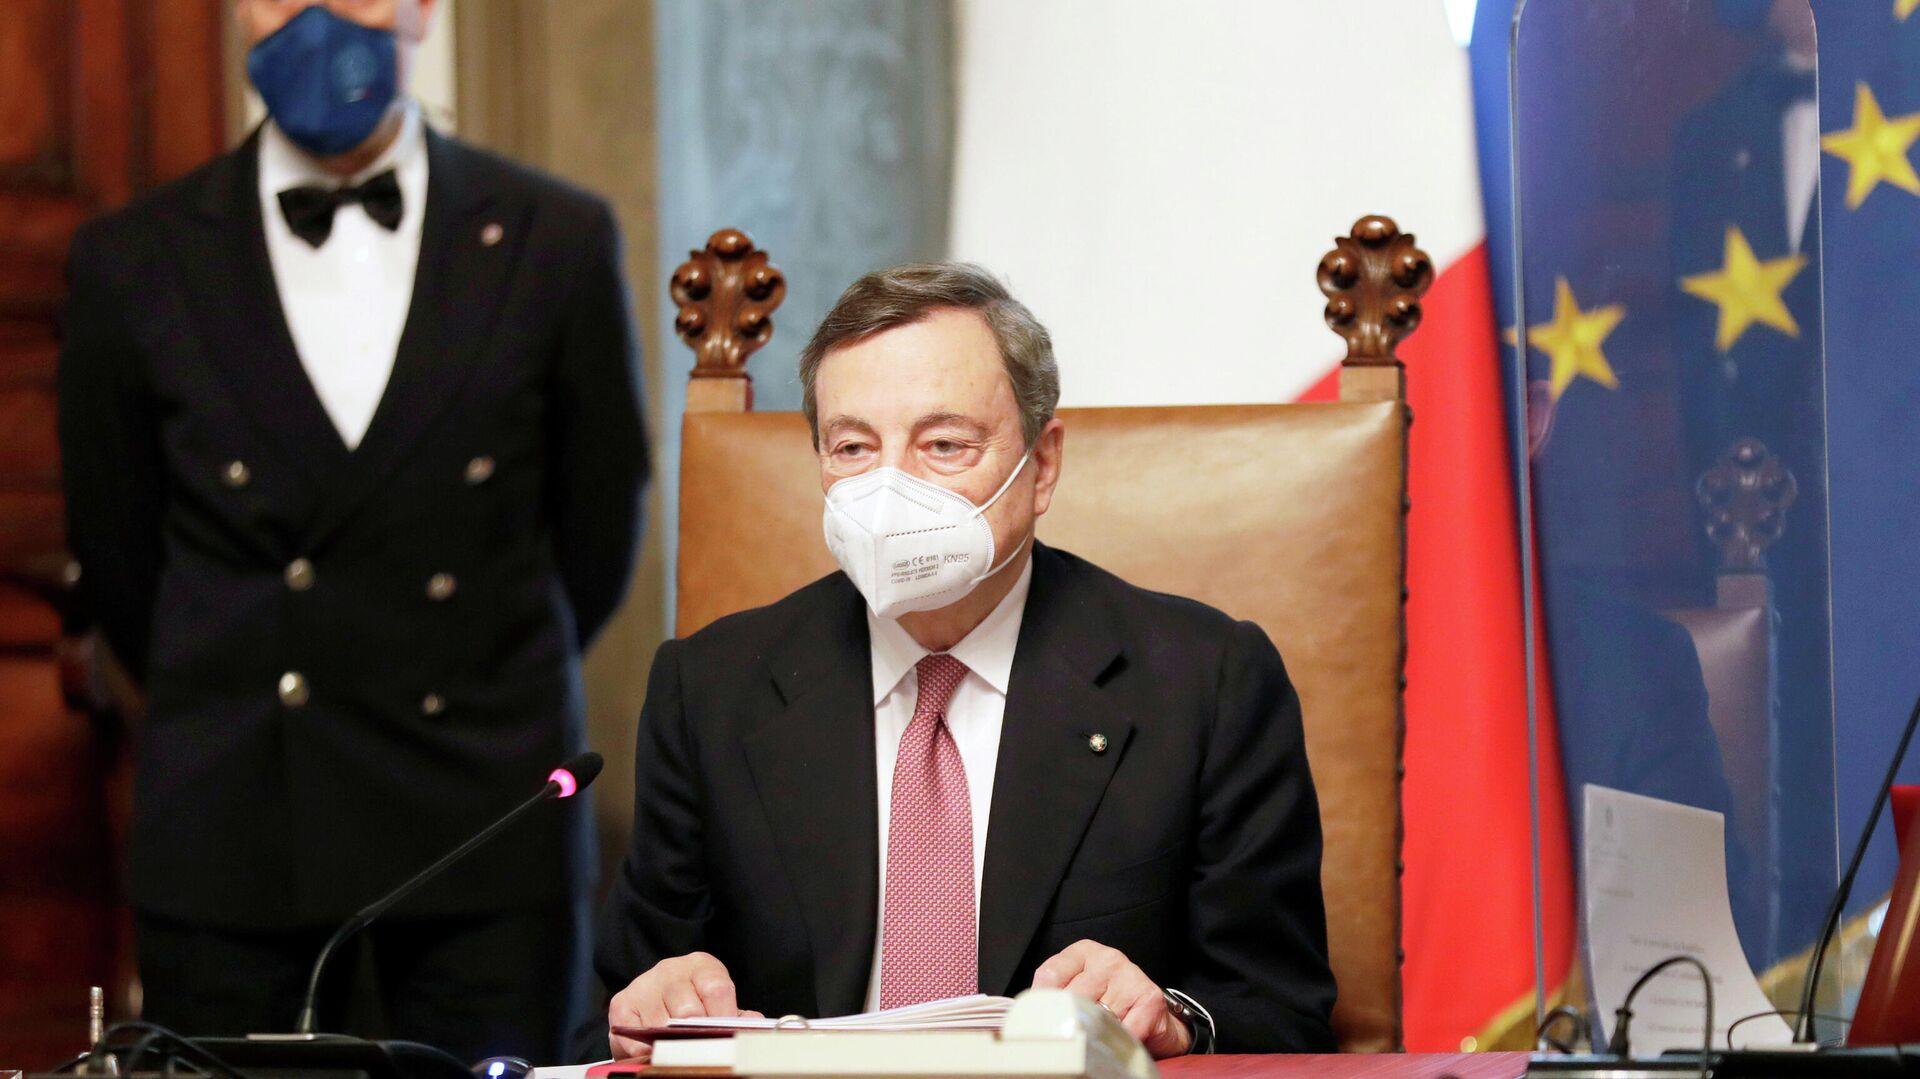 Mario Draghi, nuevo primer ministro de Italia - Sputnik Mundo, 1920, 19.03.2021